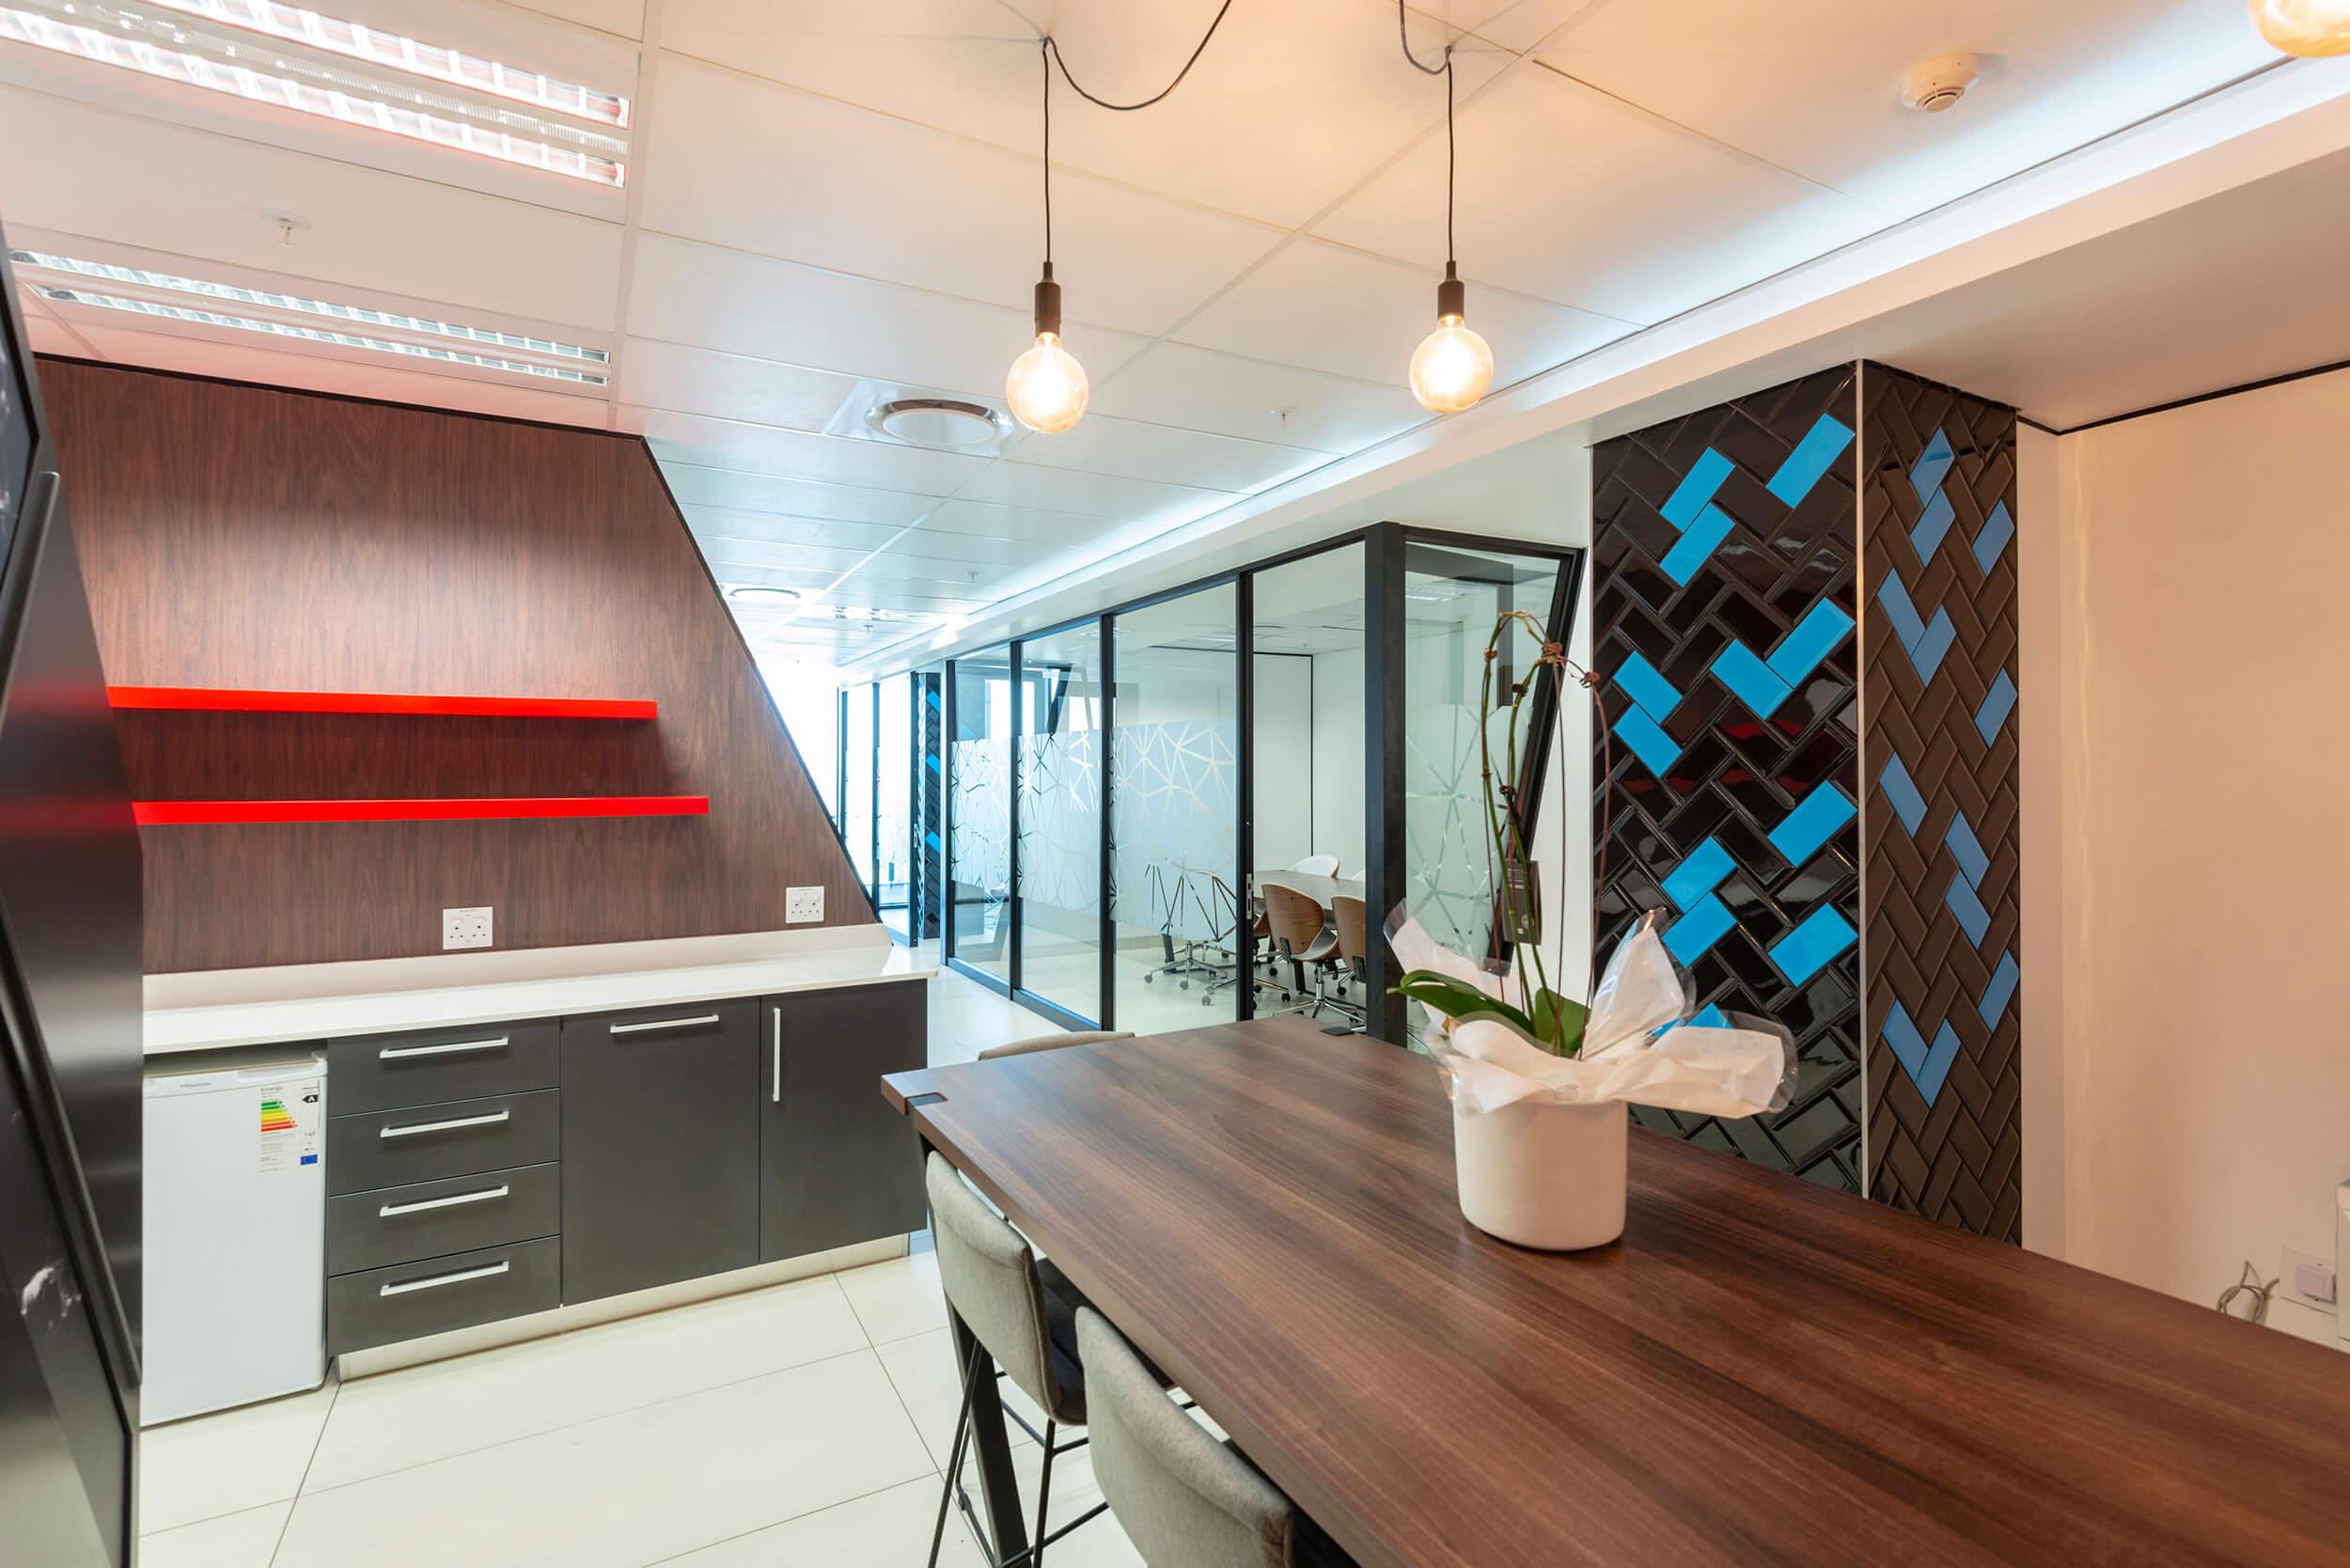 IDNIL - Turnkey Interiors - Corporate Interior Design and Build